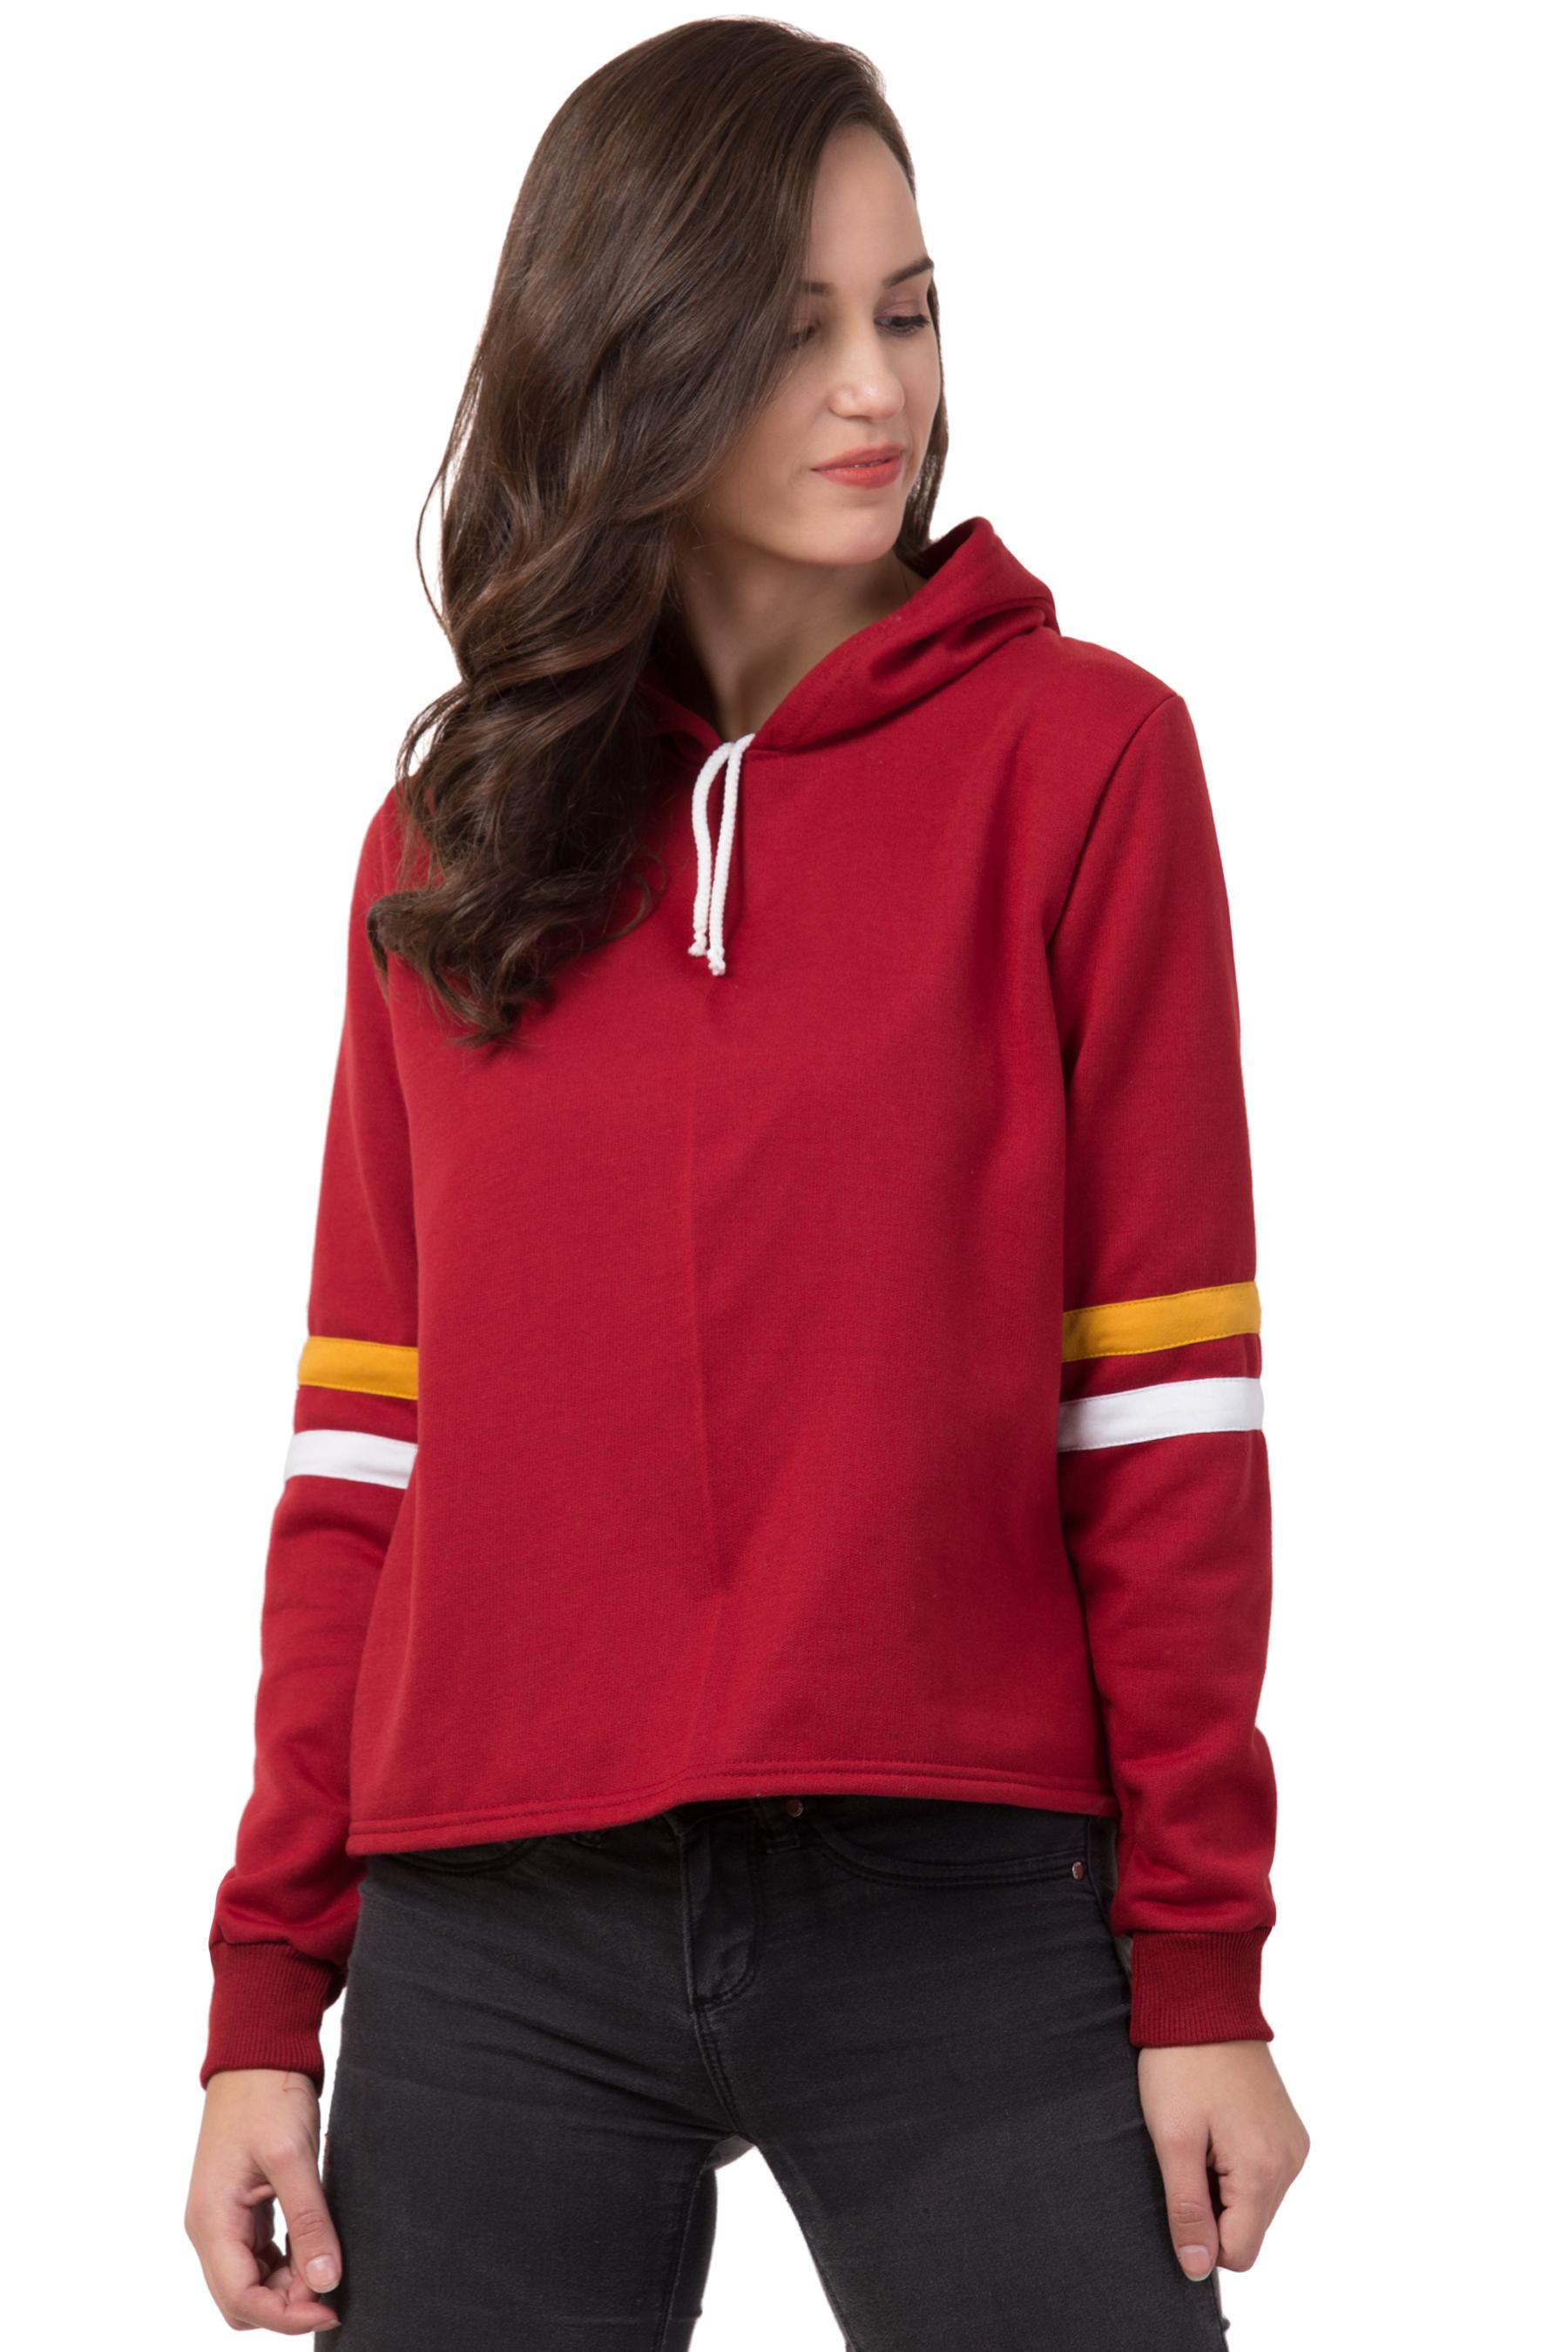 Bestic Fashion Full Sleeve Solid Women Sweatshirt Hoodies